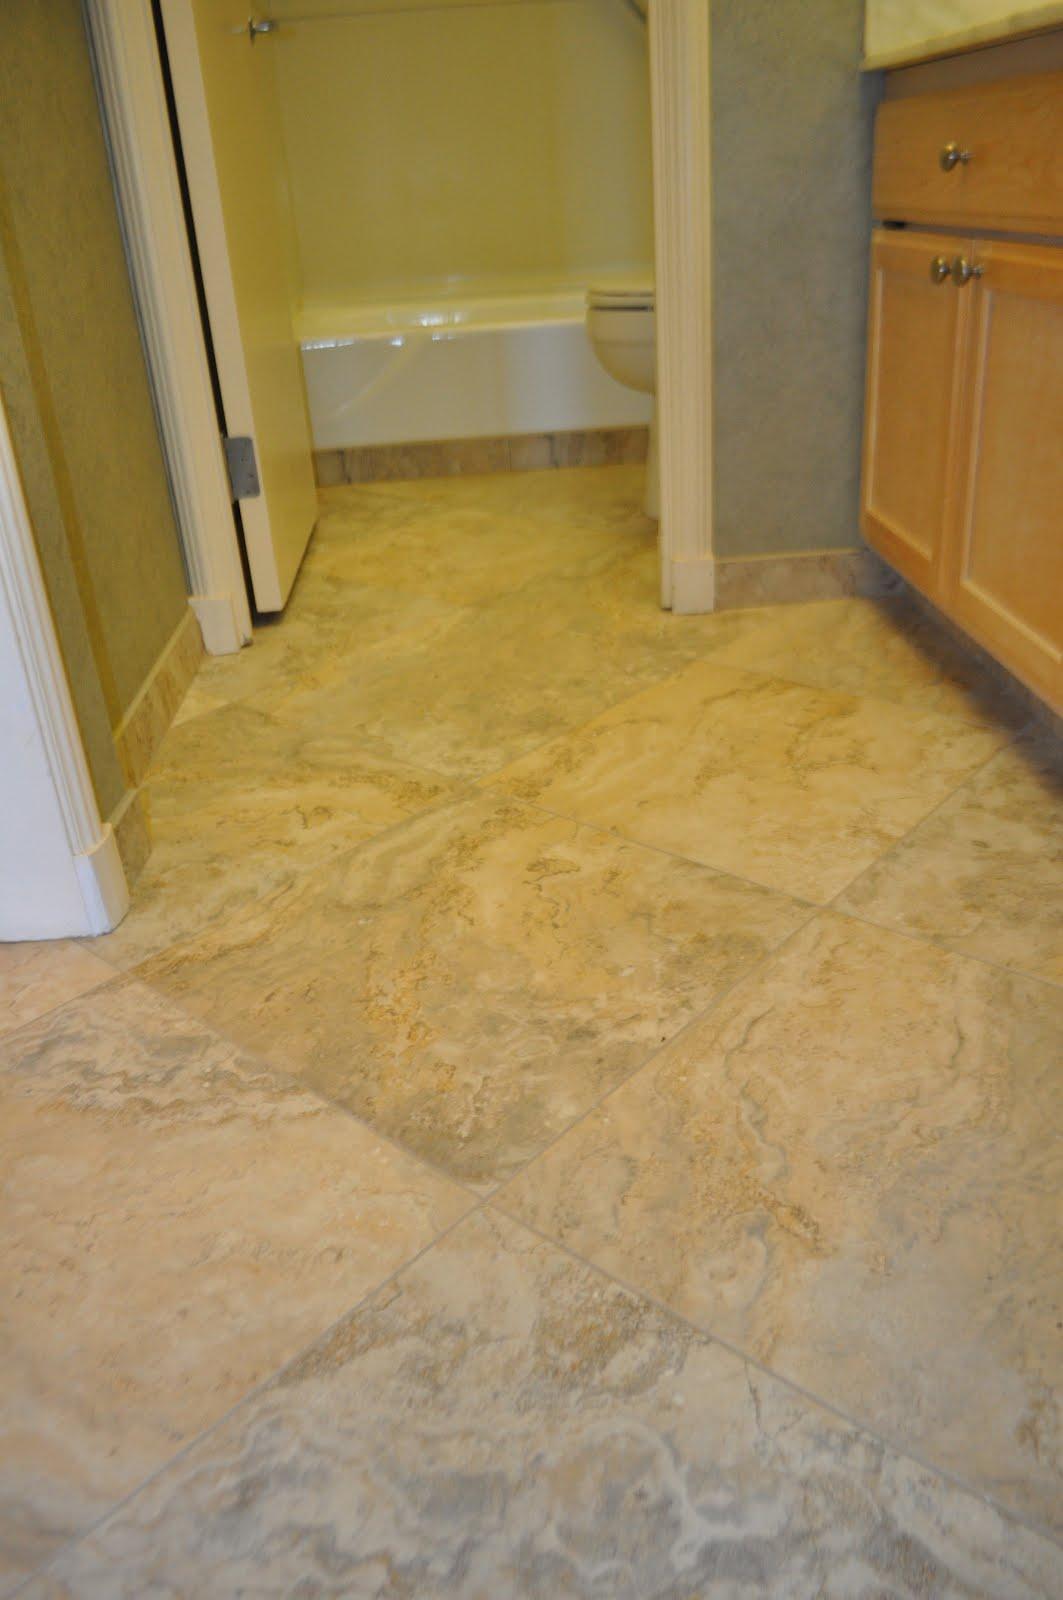 Tile floor baseboard